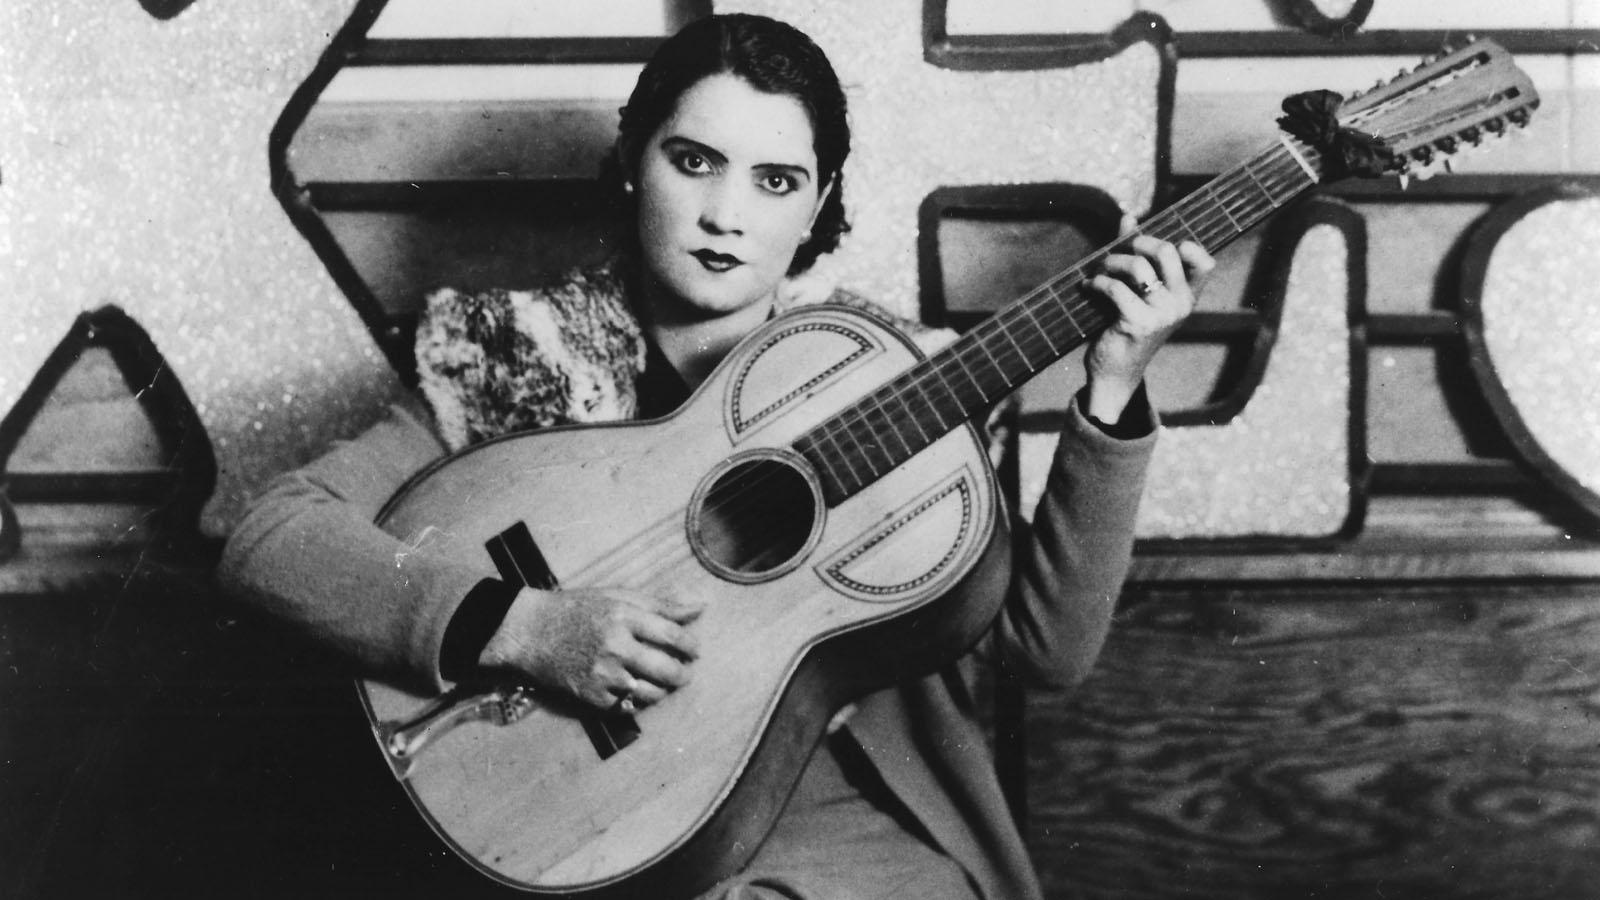 Lydia Mendoza from Chulas Fronteras